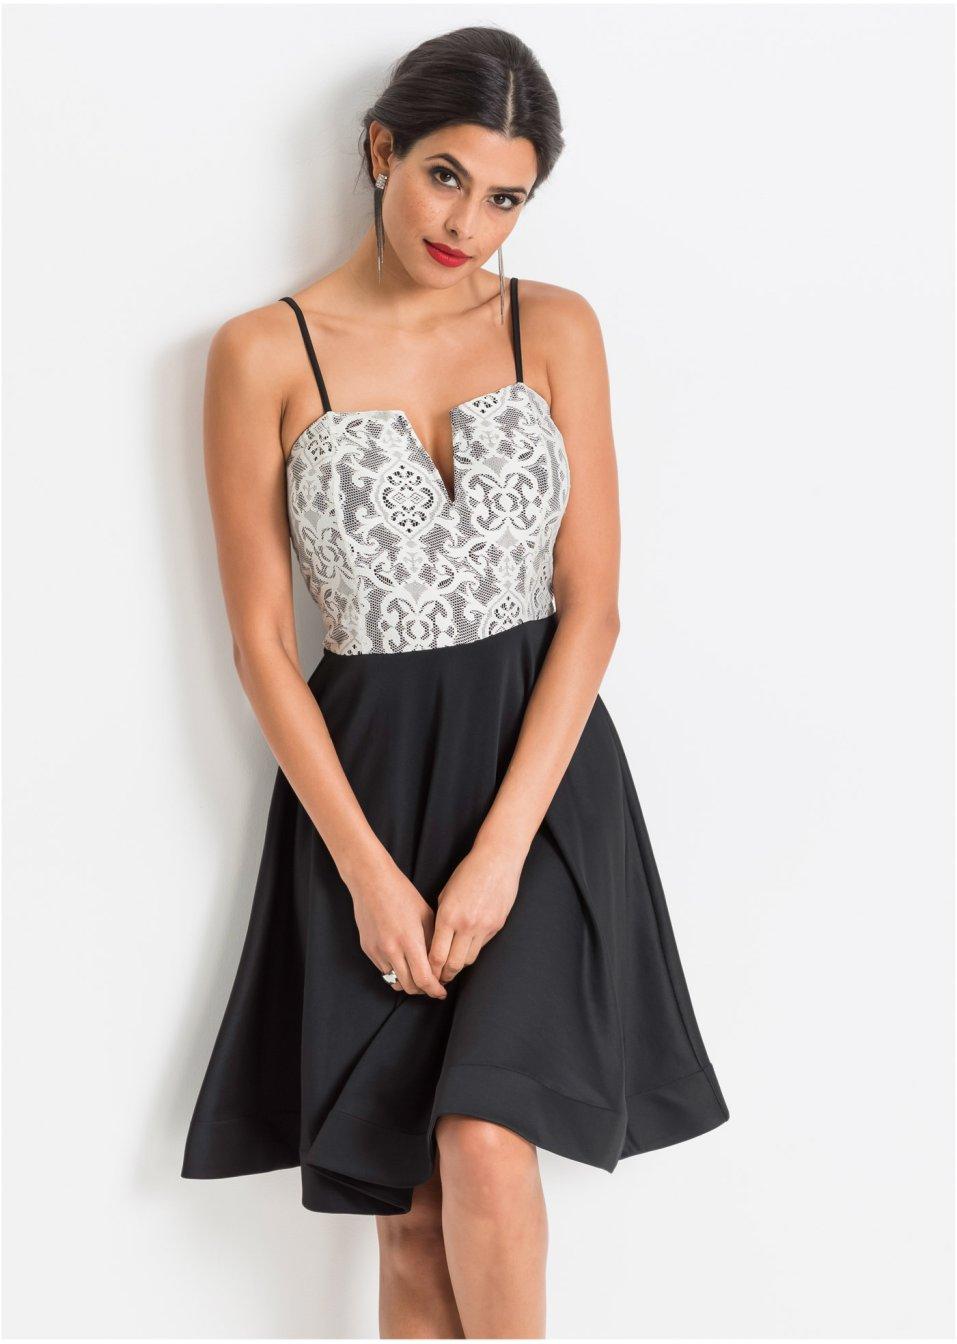 kurzes Kleid schwarz/cremeweiss - Damen - bonprix.de